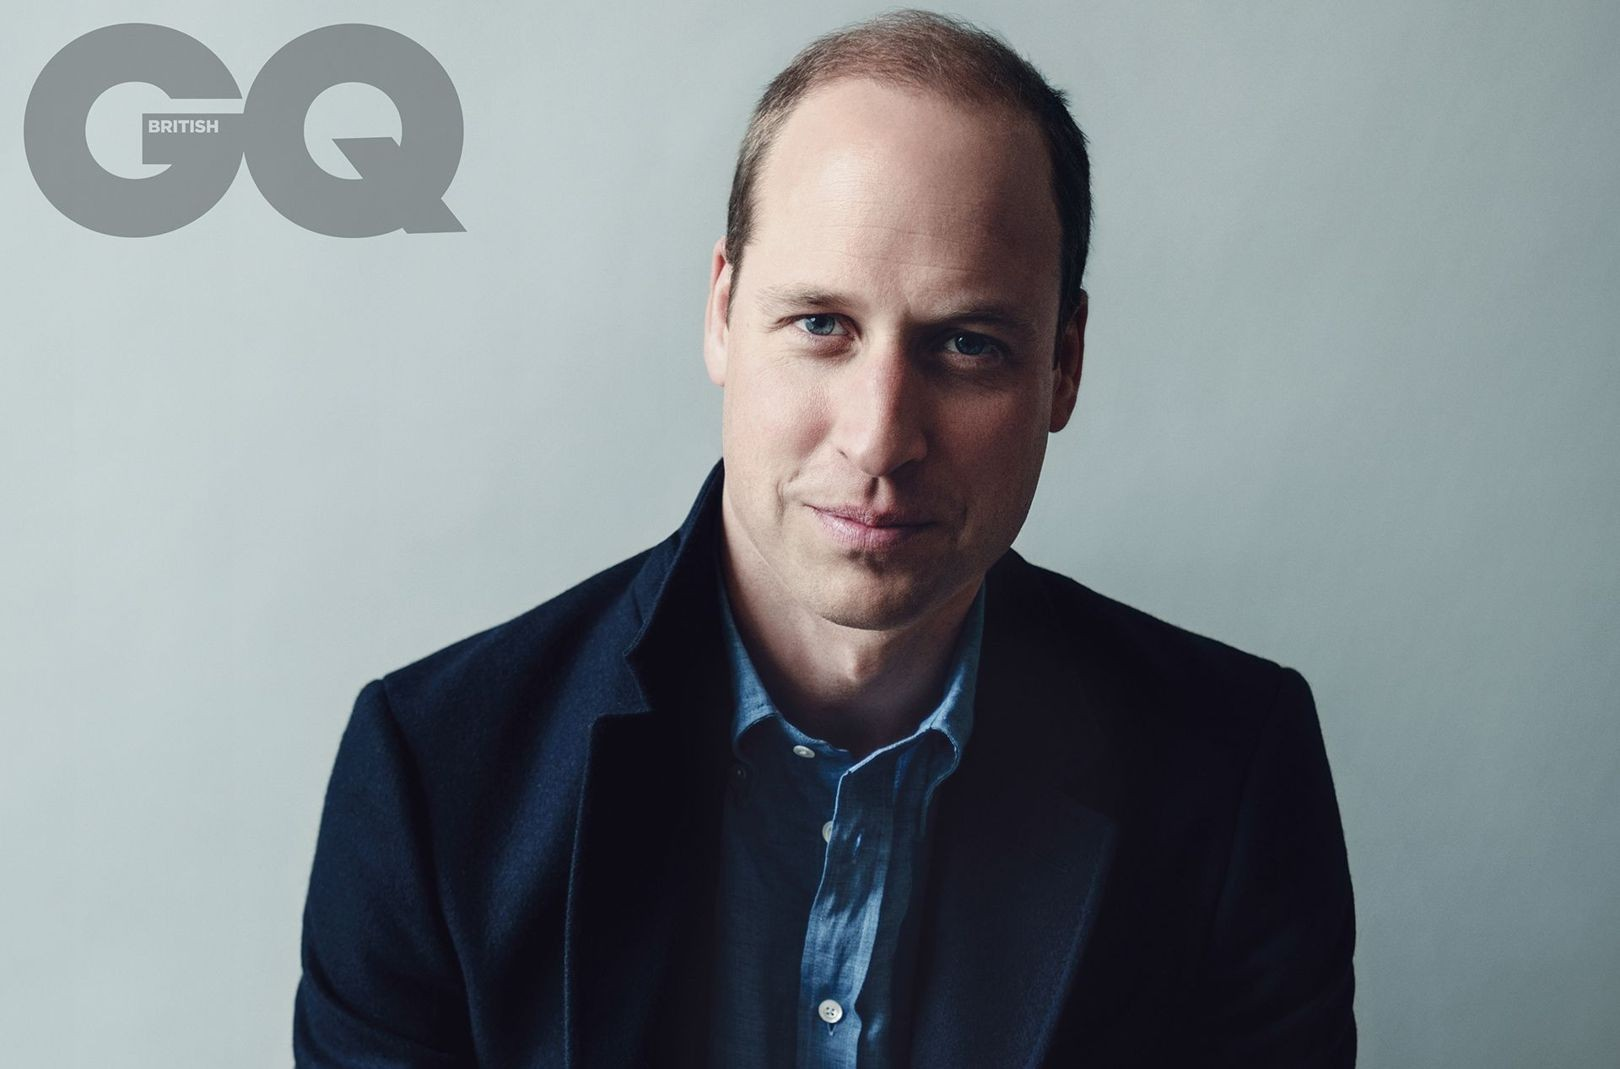 Príncipe William para a GQ britânica (Foto: Norman Jean Roy)